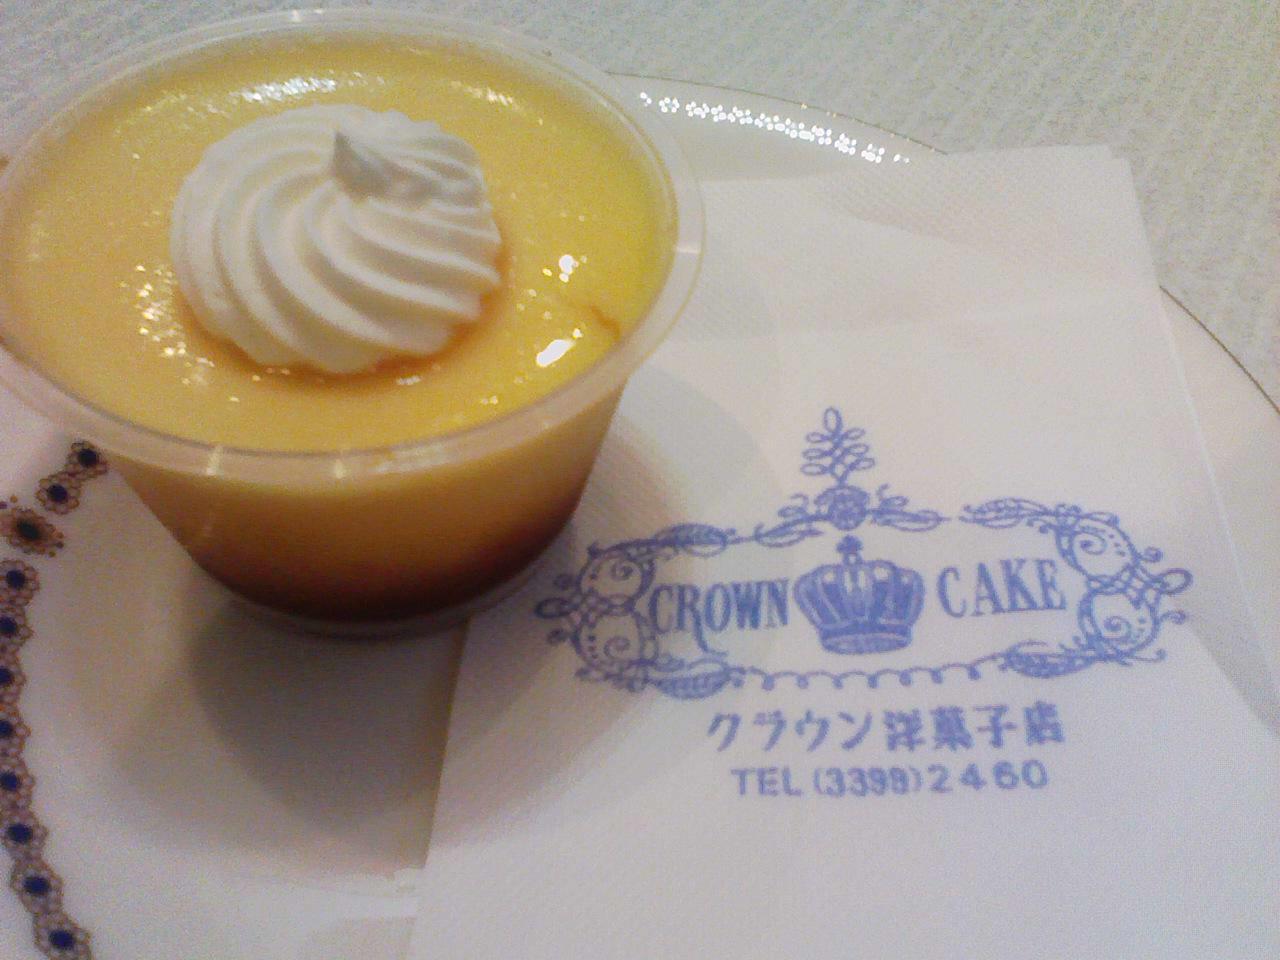 クラウン洋菓子店